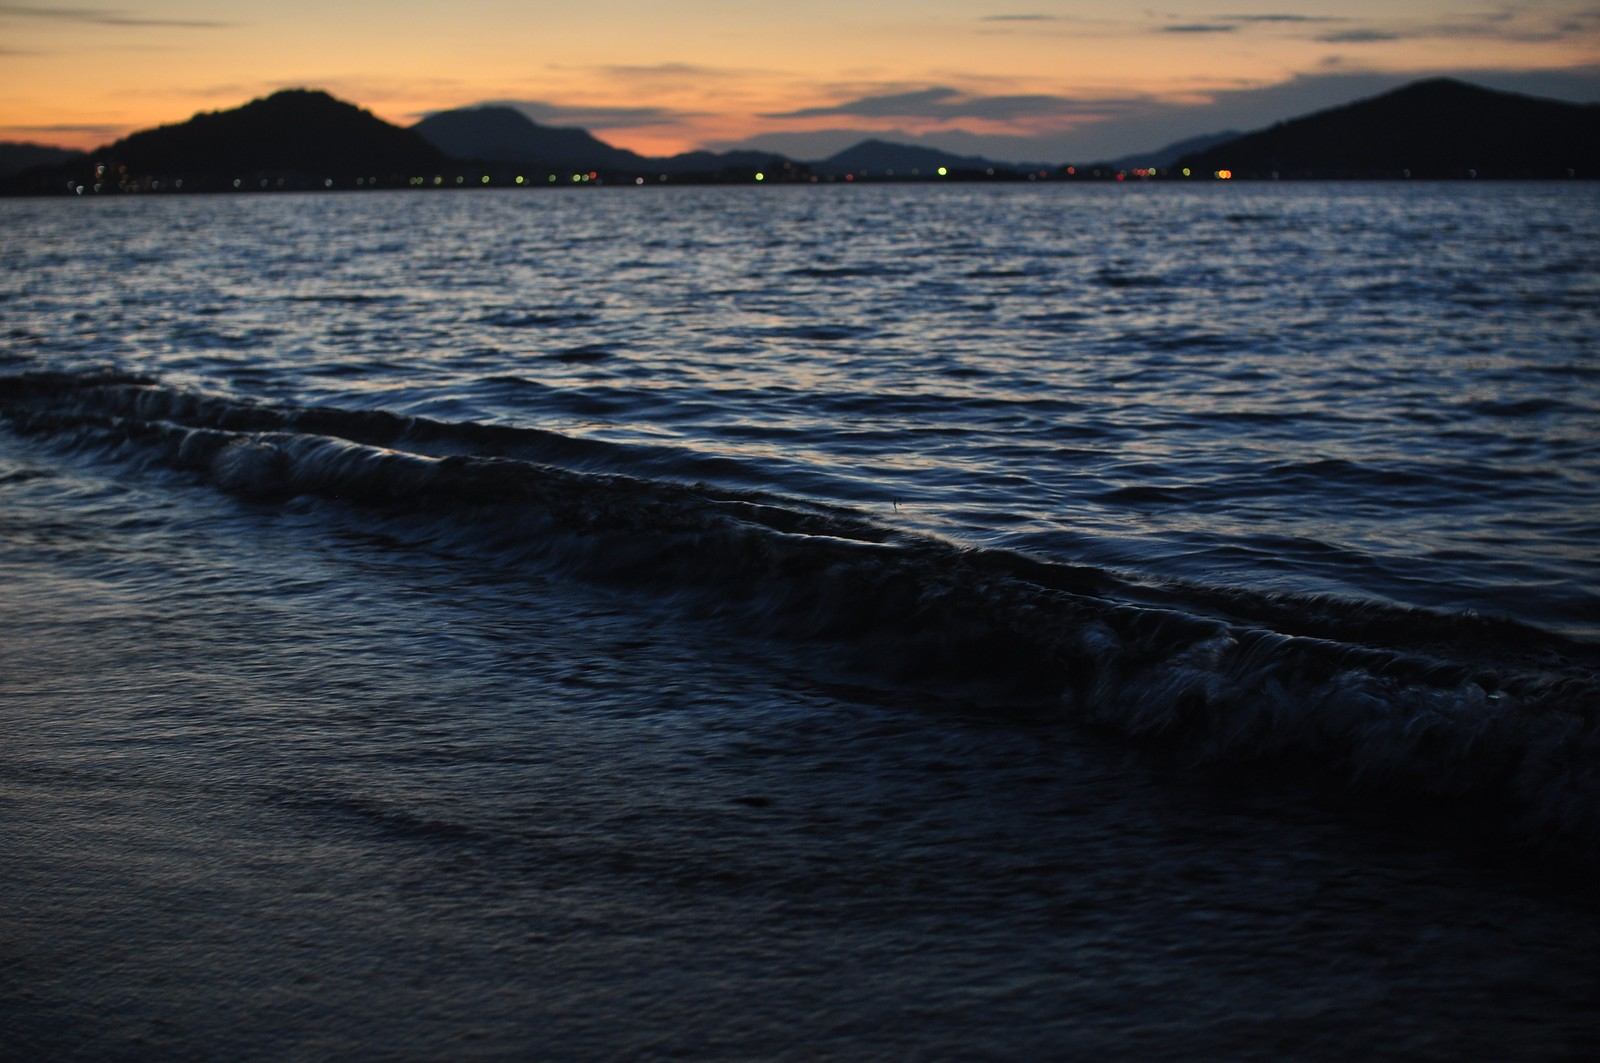 Nagatare beach